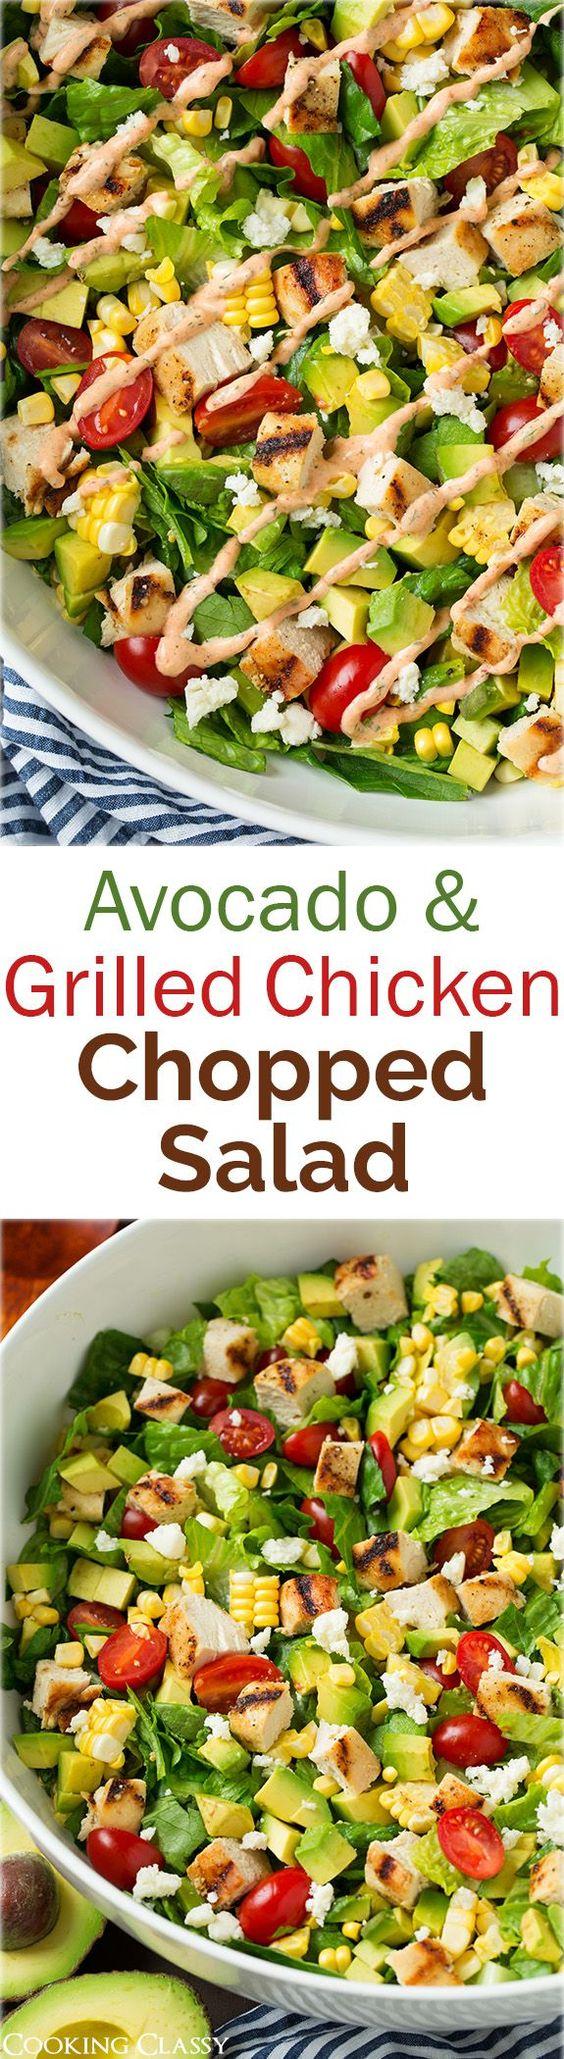 ... chicken salad dressings chicken tender recipes skinny dips grilled